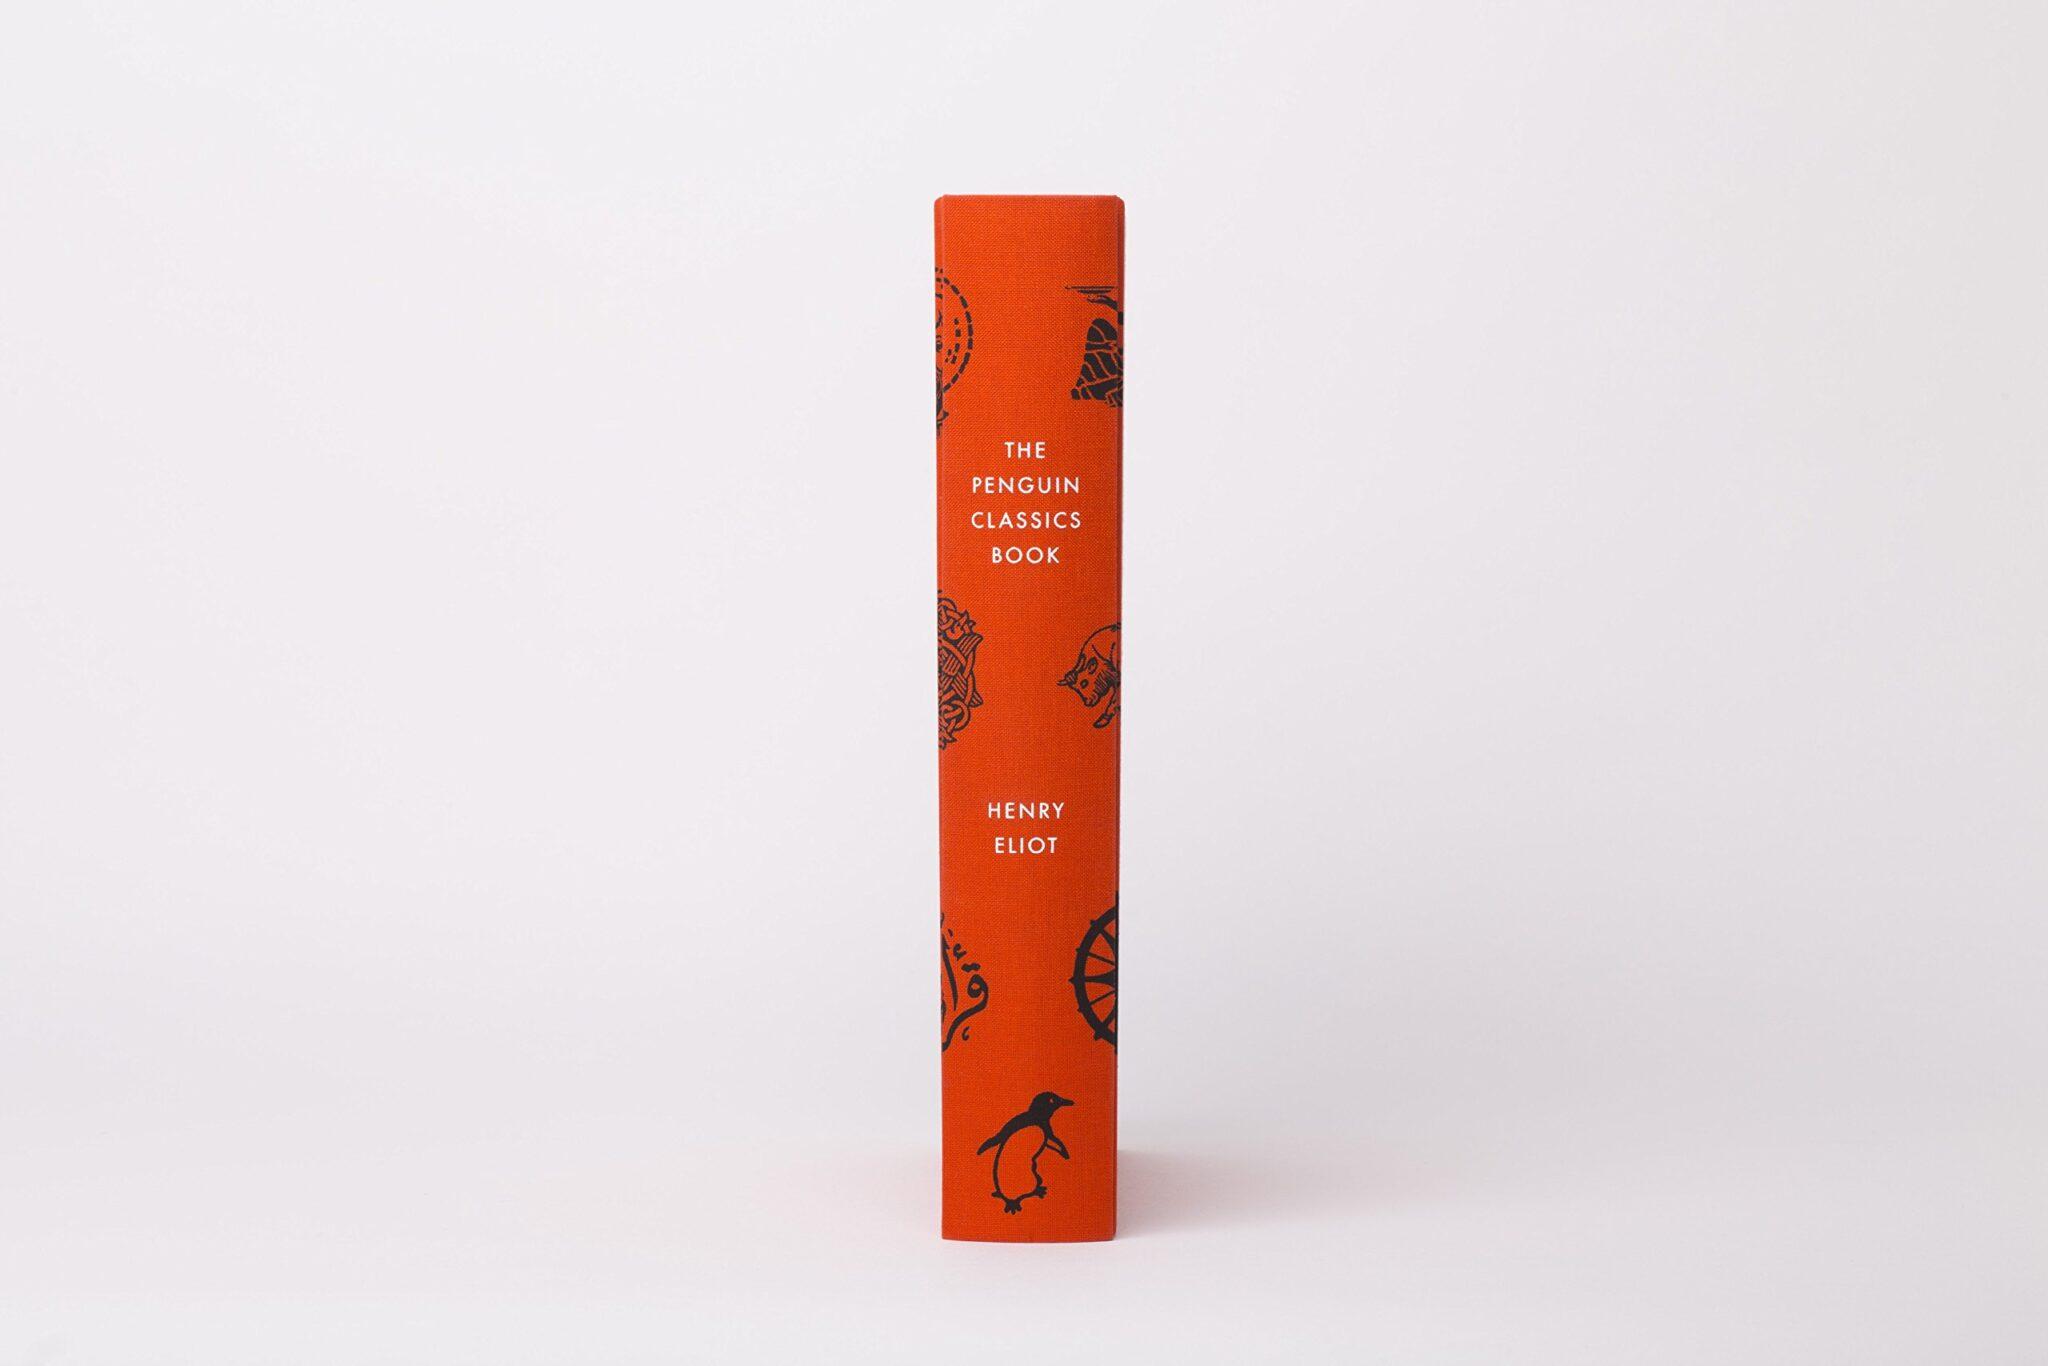 Henry Eliot The Penguin Classics Book Spine